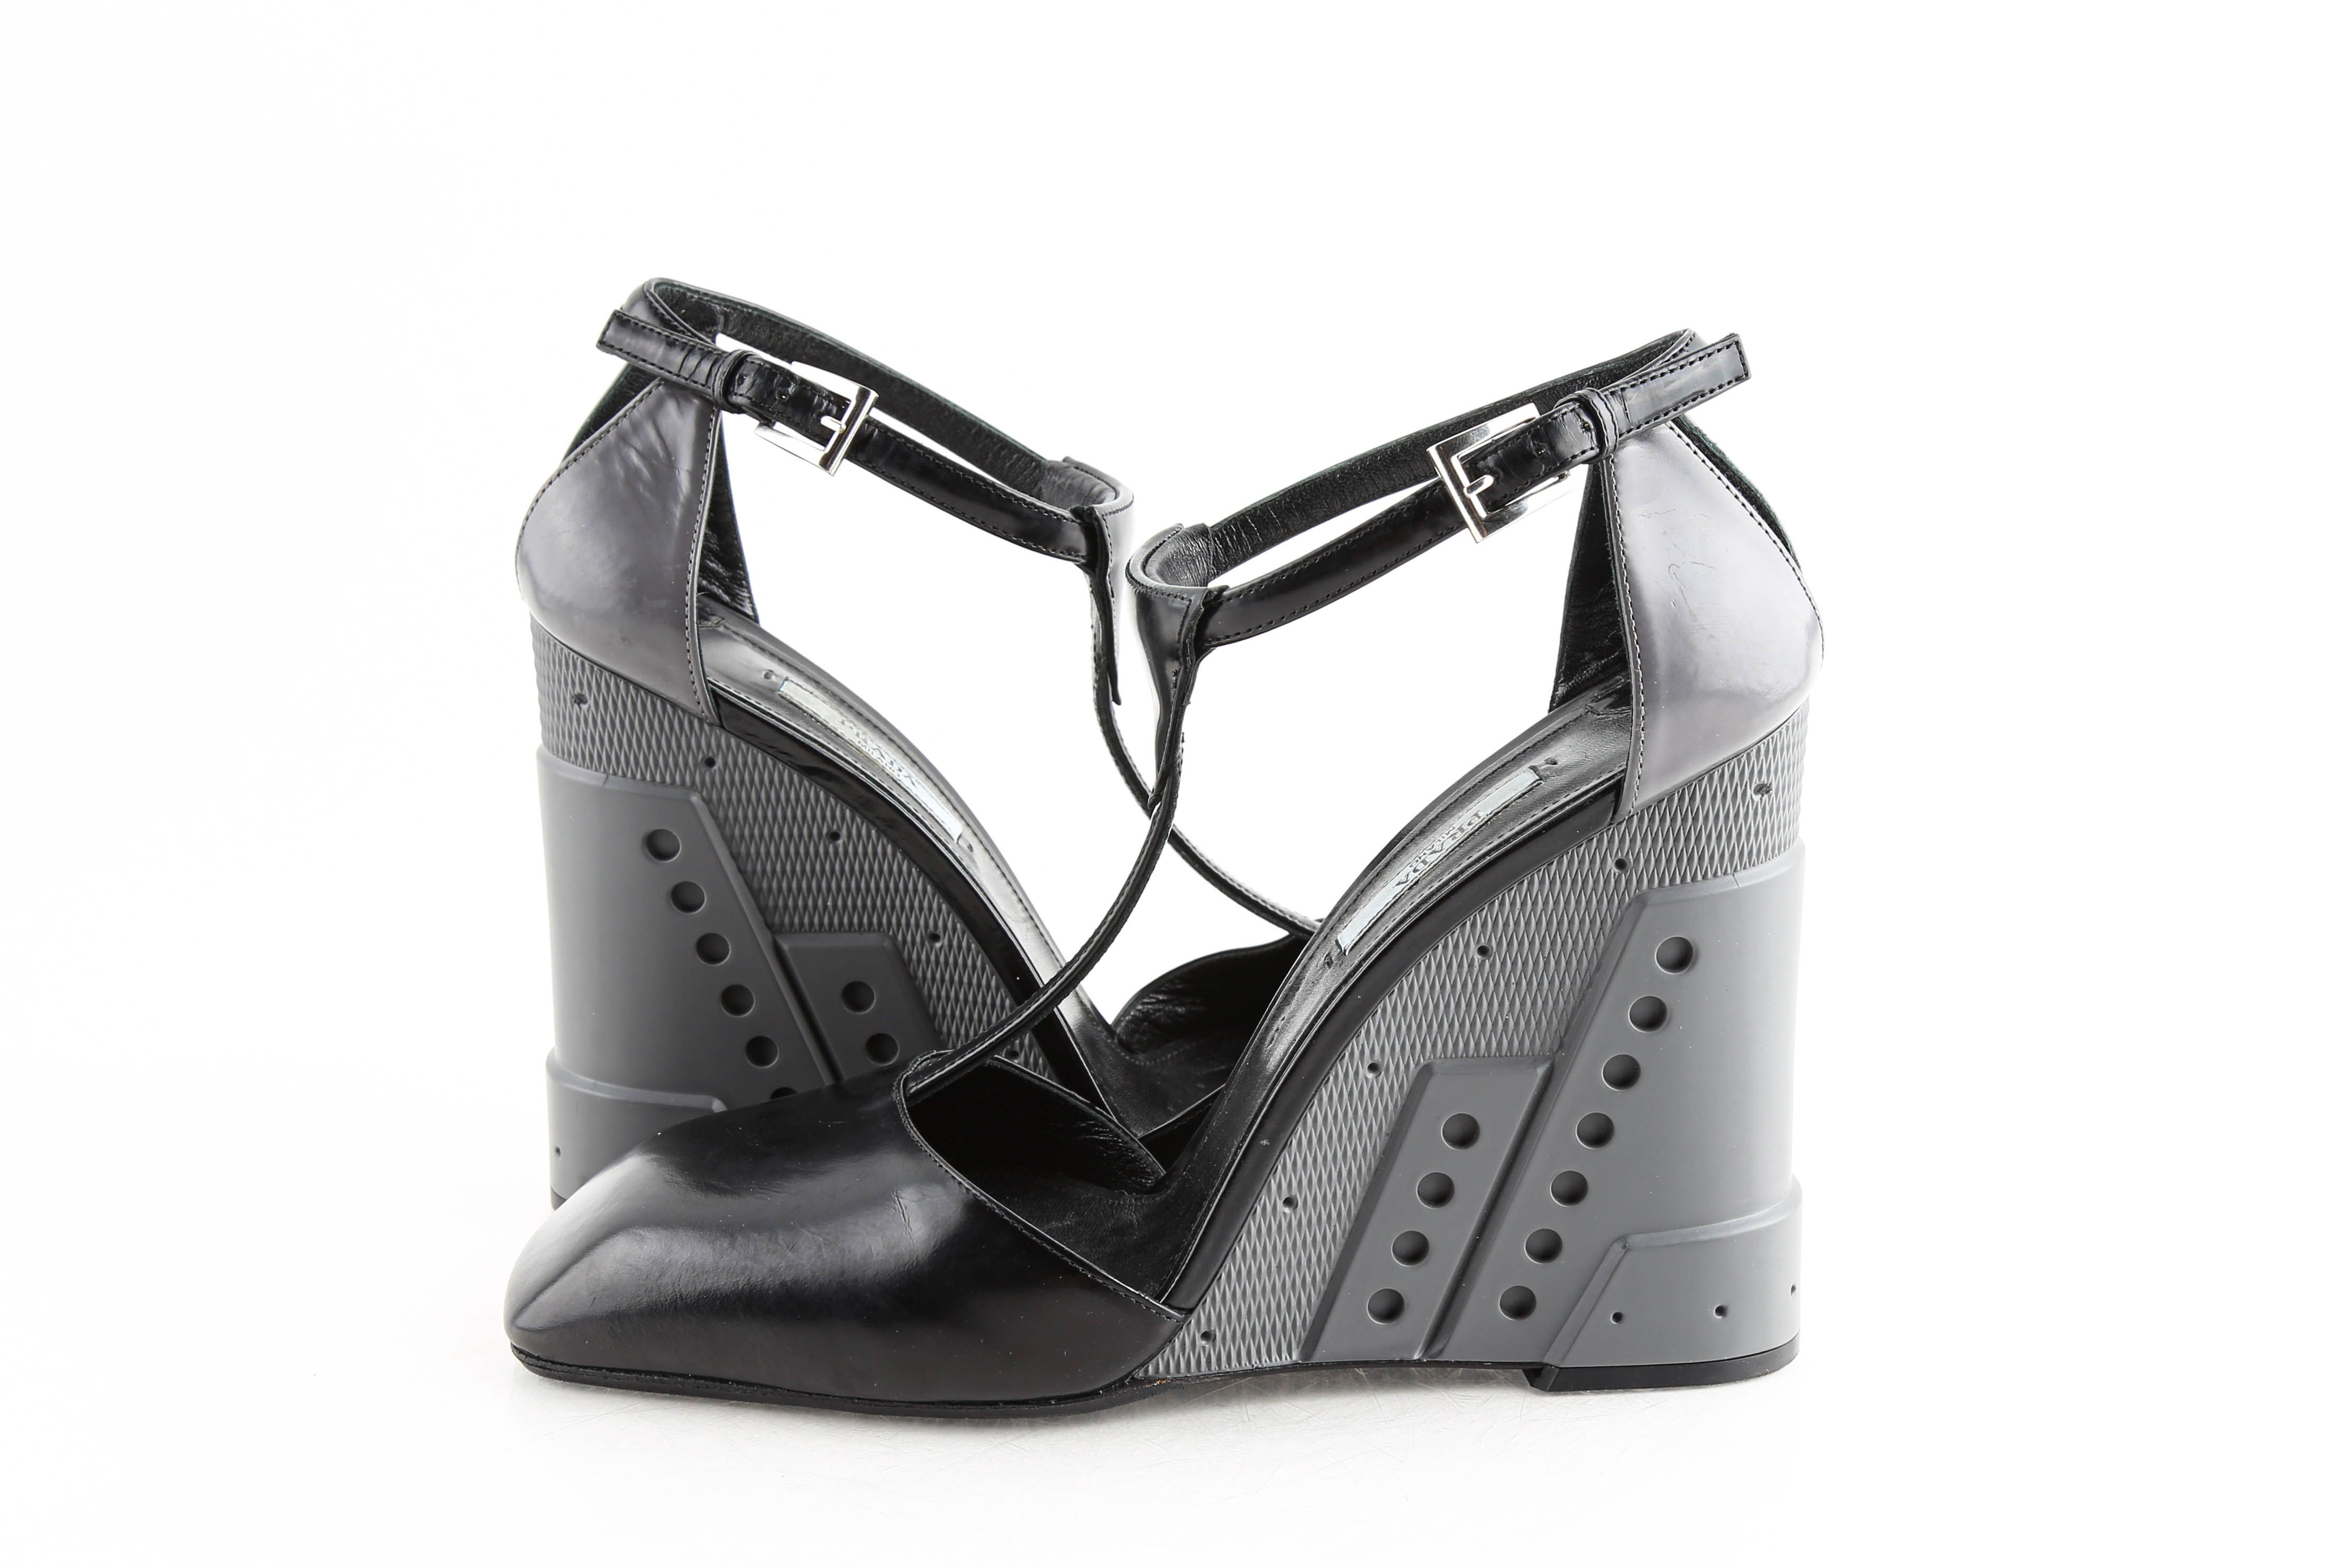 Prada Black/grey Leather Futuristic